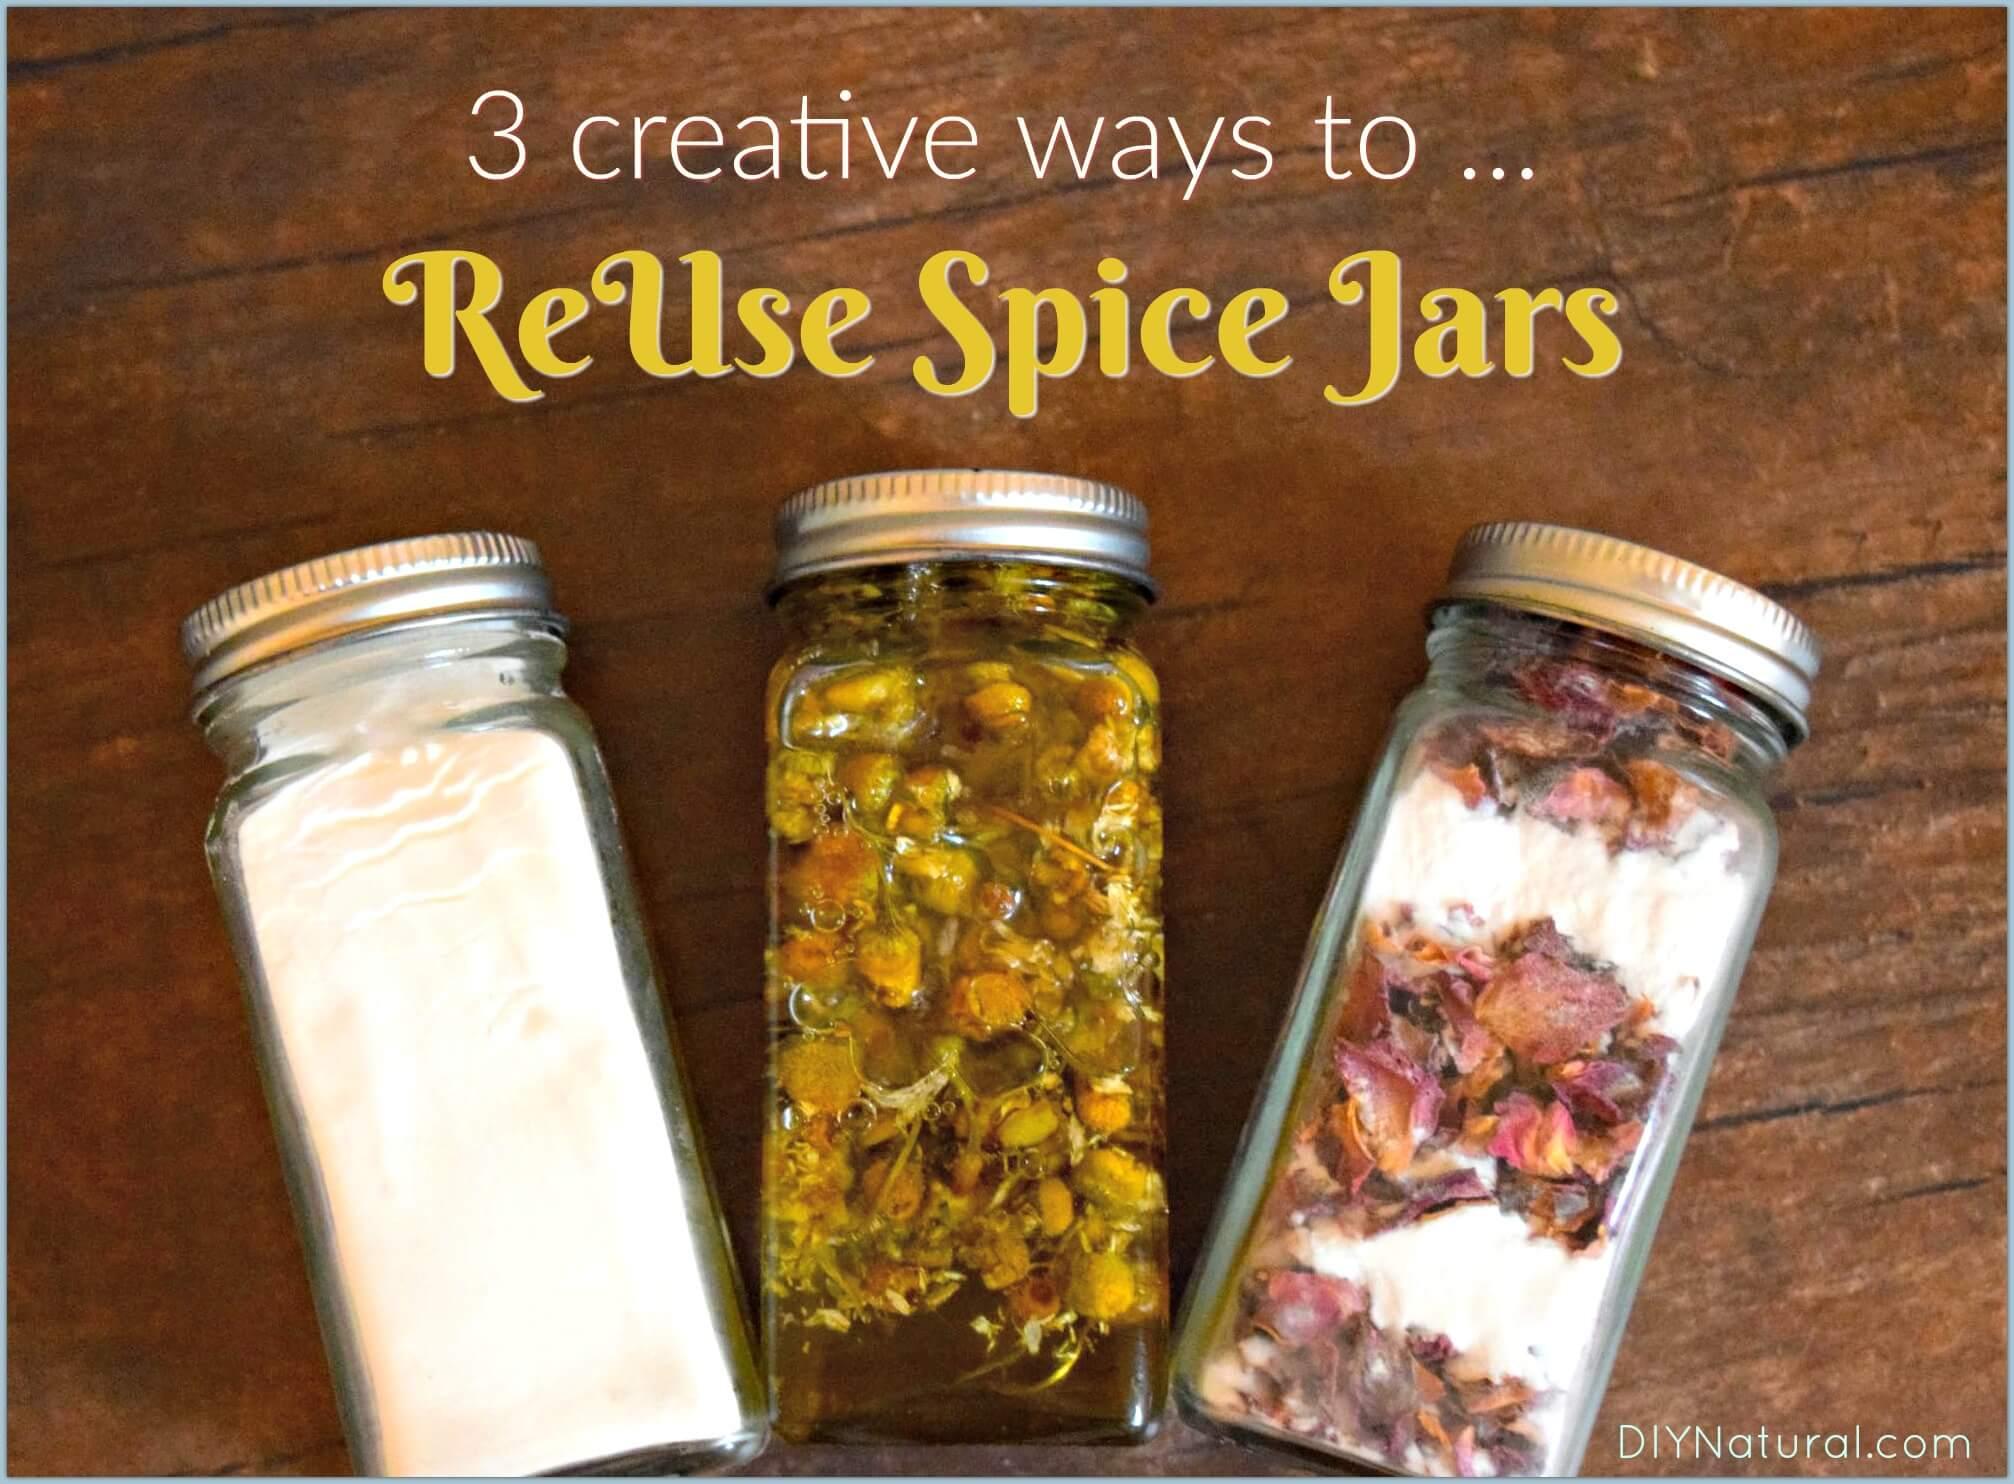 Reuse Spice Jars 3 Creative Ways To Reuse Glass Spice Jars